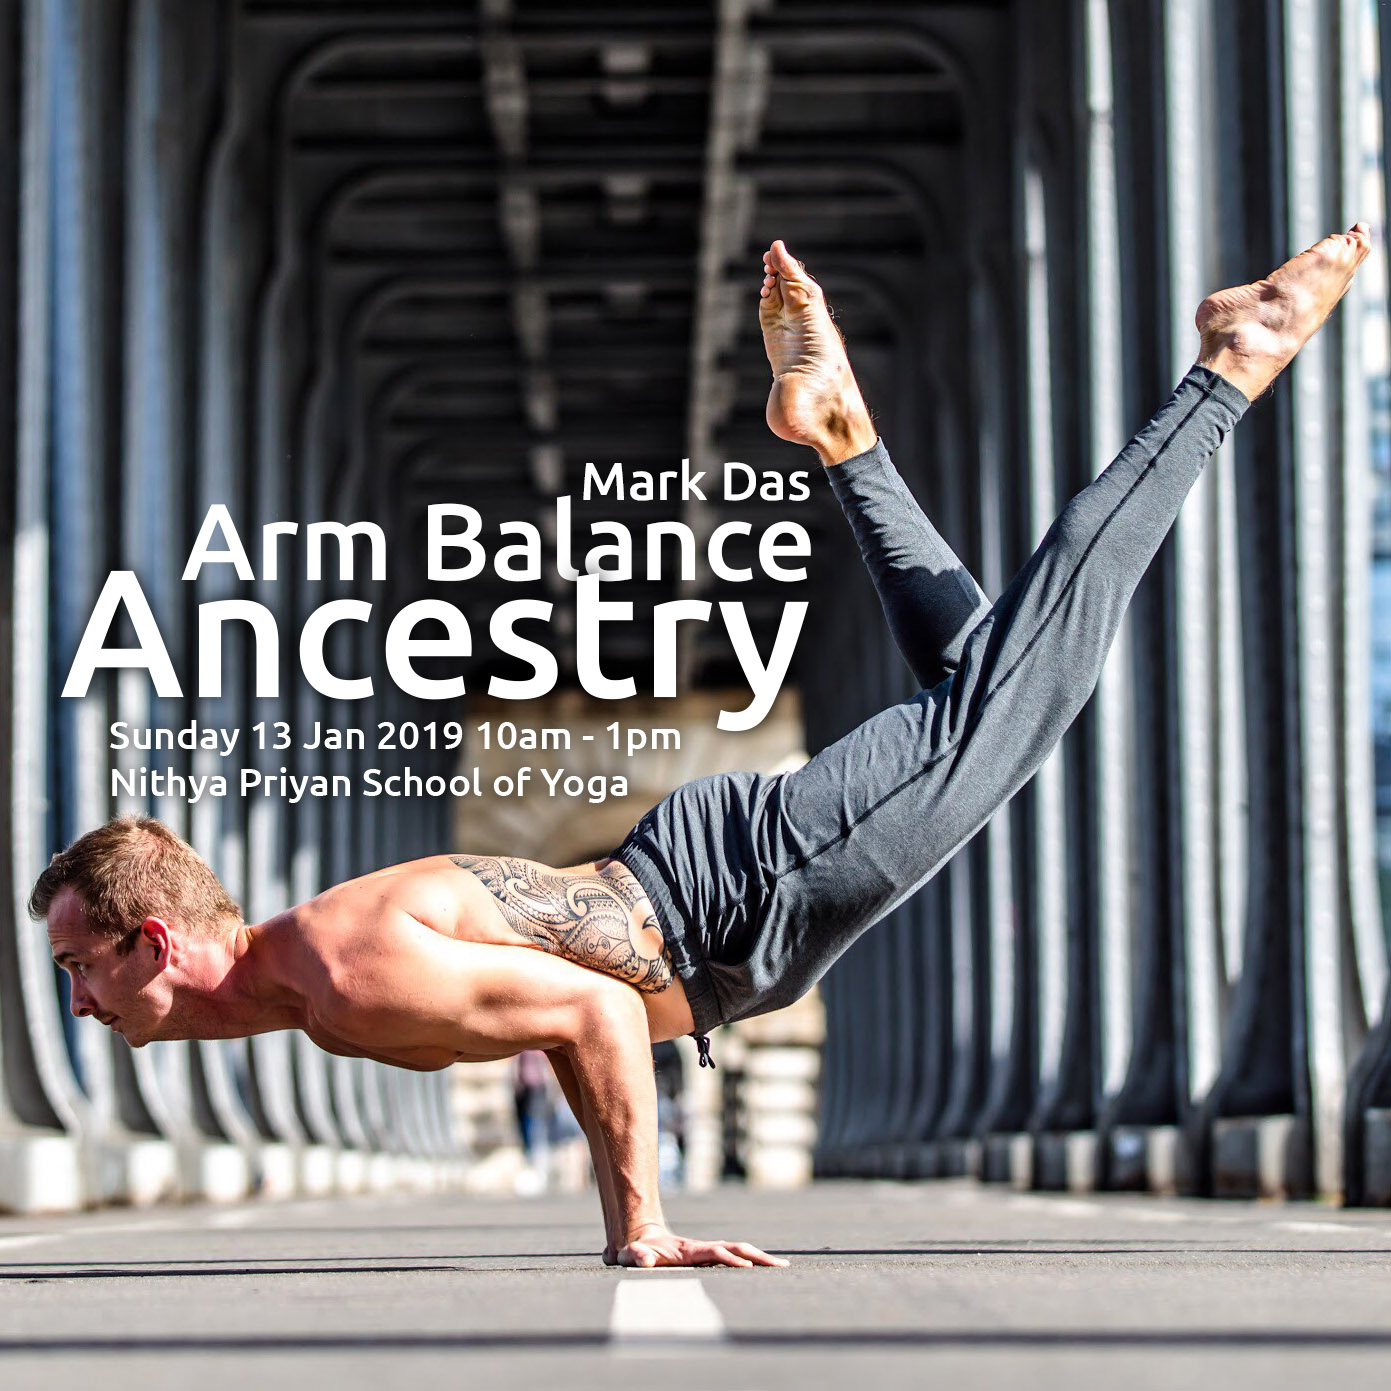 arm balance ancestry.jpg